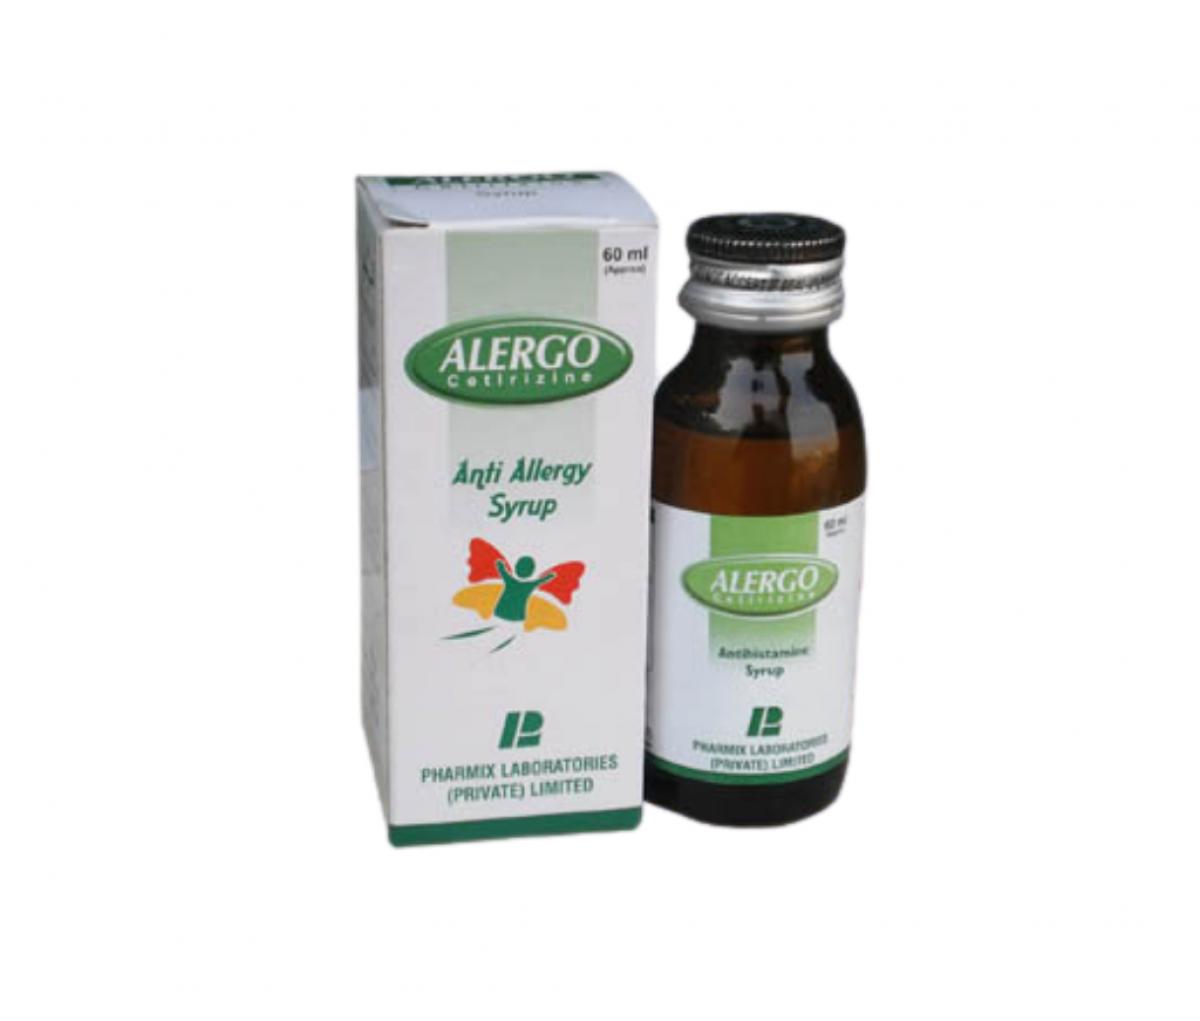 Alergo 5mg Oral Liquid 60ml